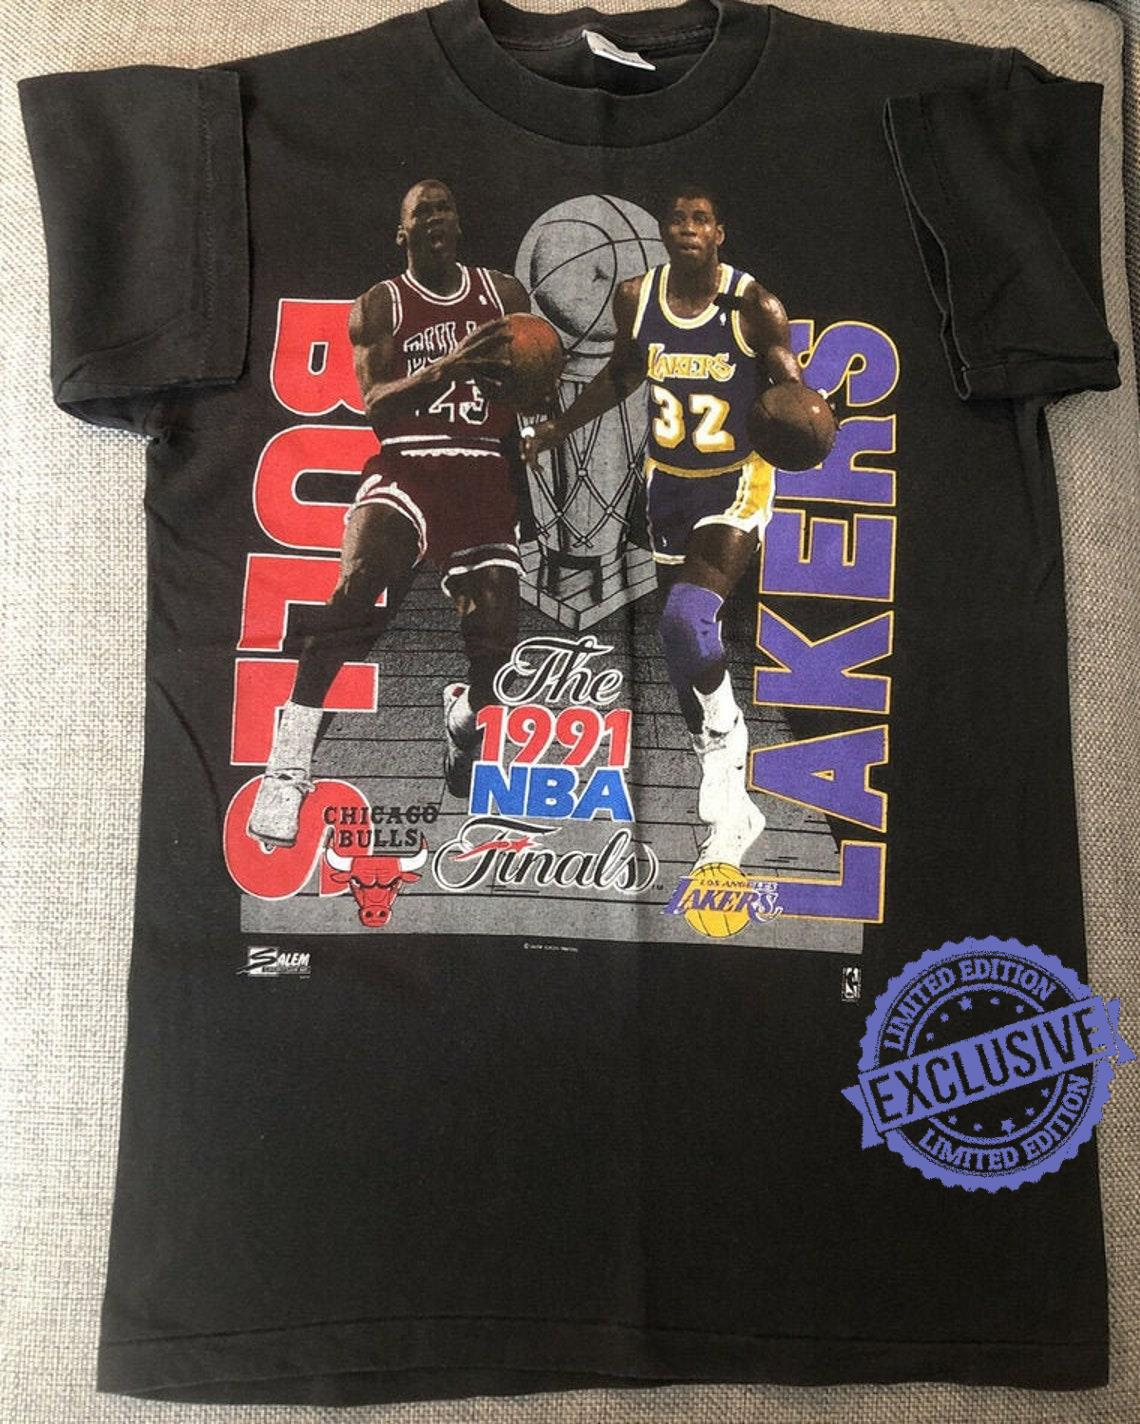 Vintage 1991 NBA Finals MICHAEL JORDAN Magic Johnson T-Shirt